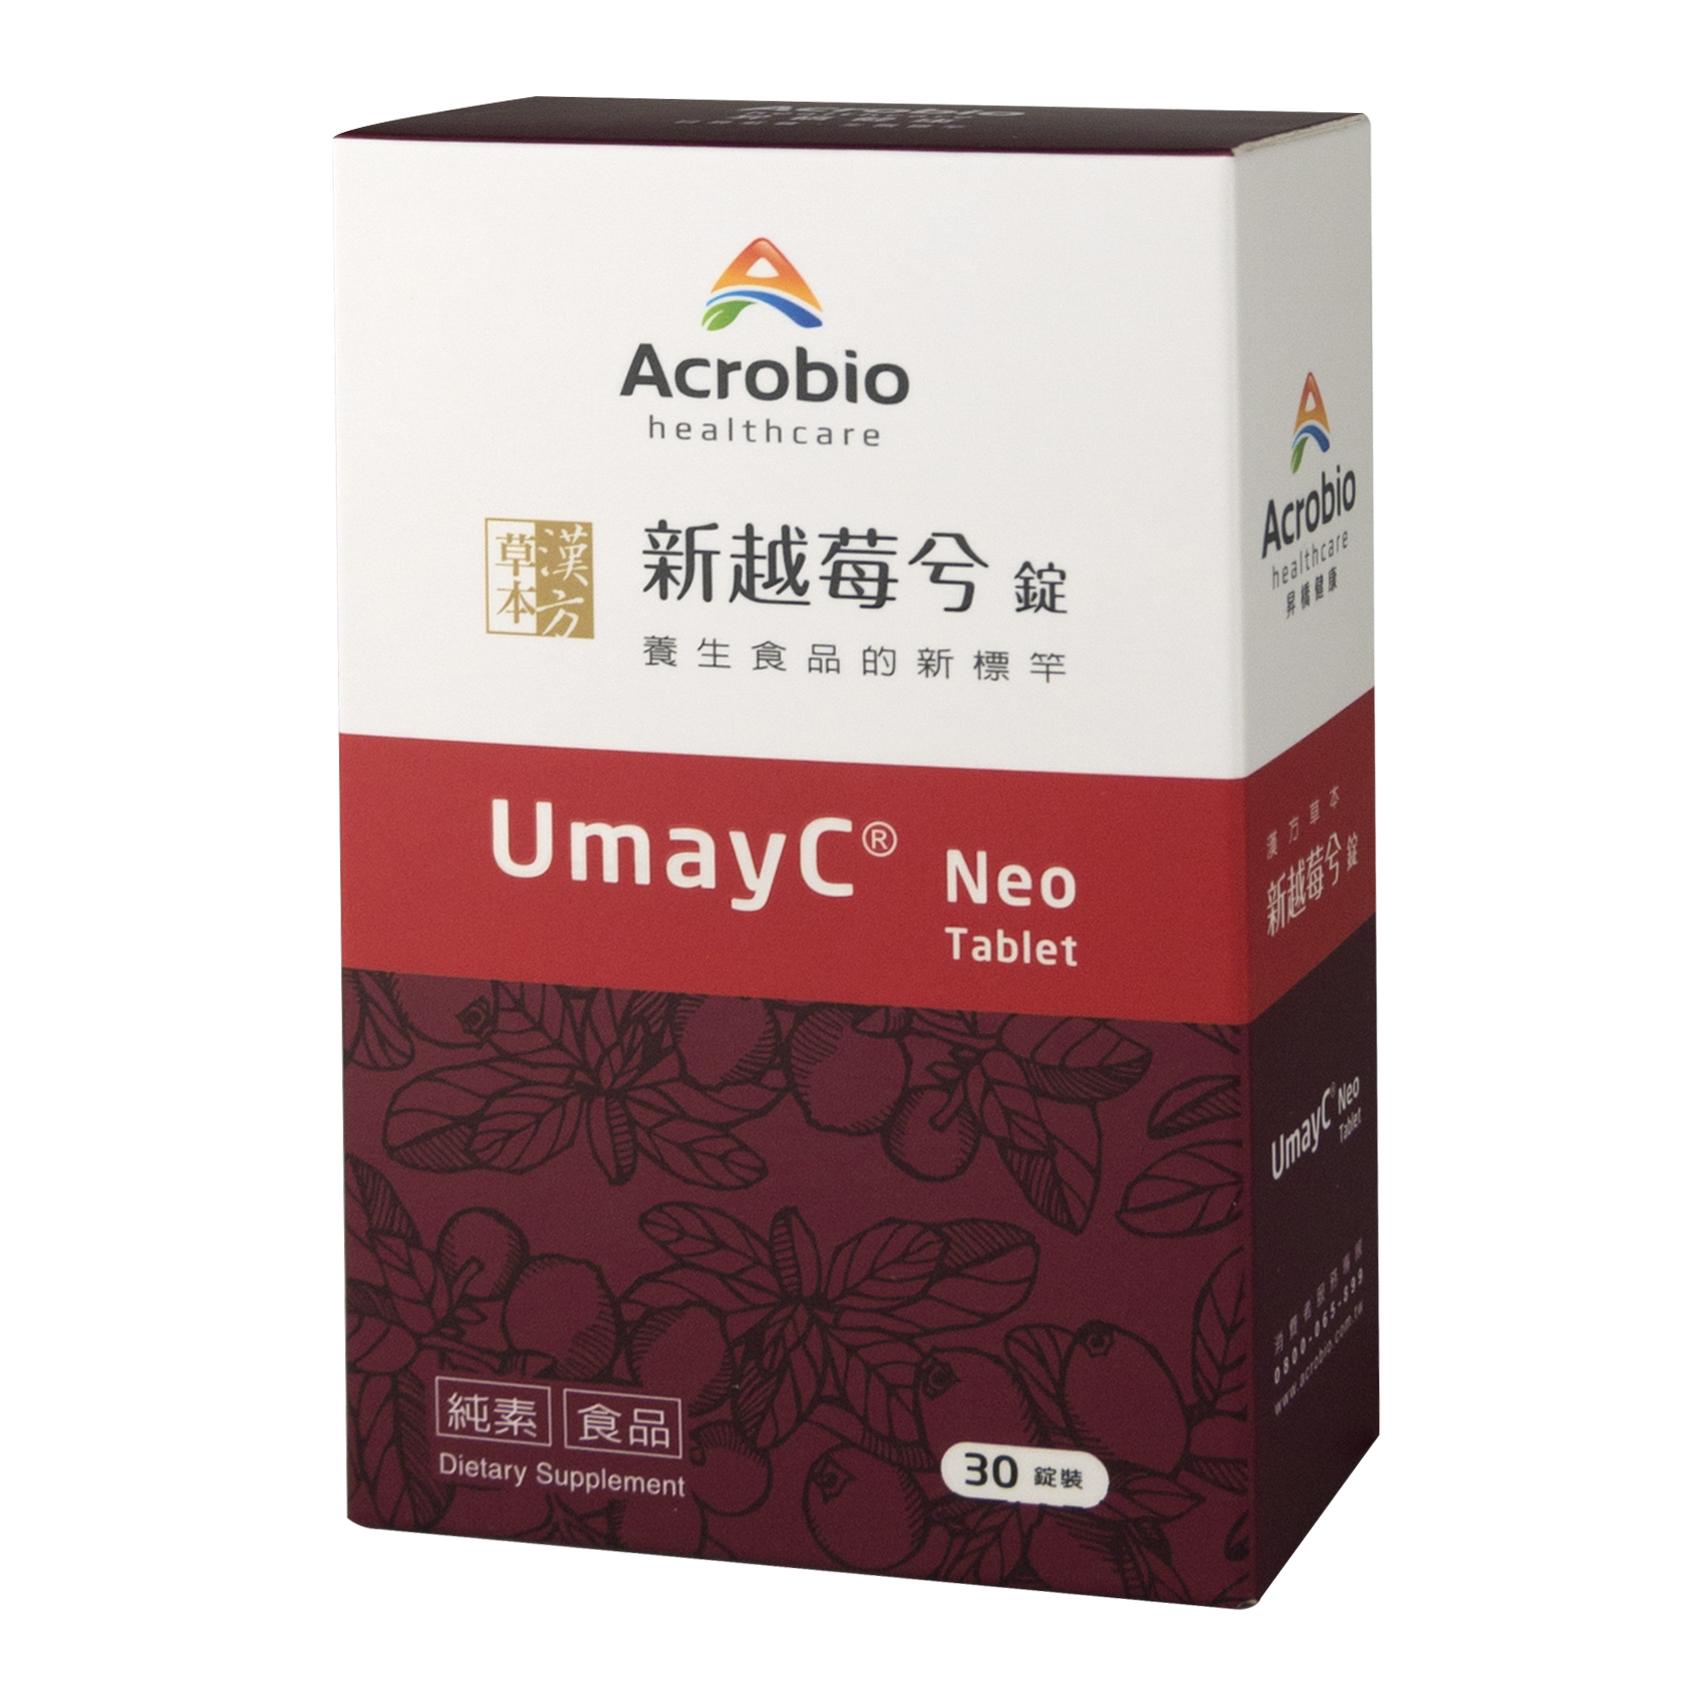 UmayC Neo 新越莓兮錠-30錠